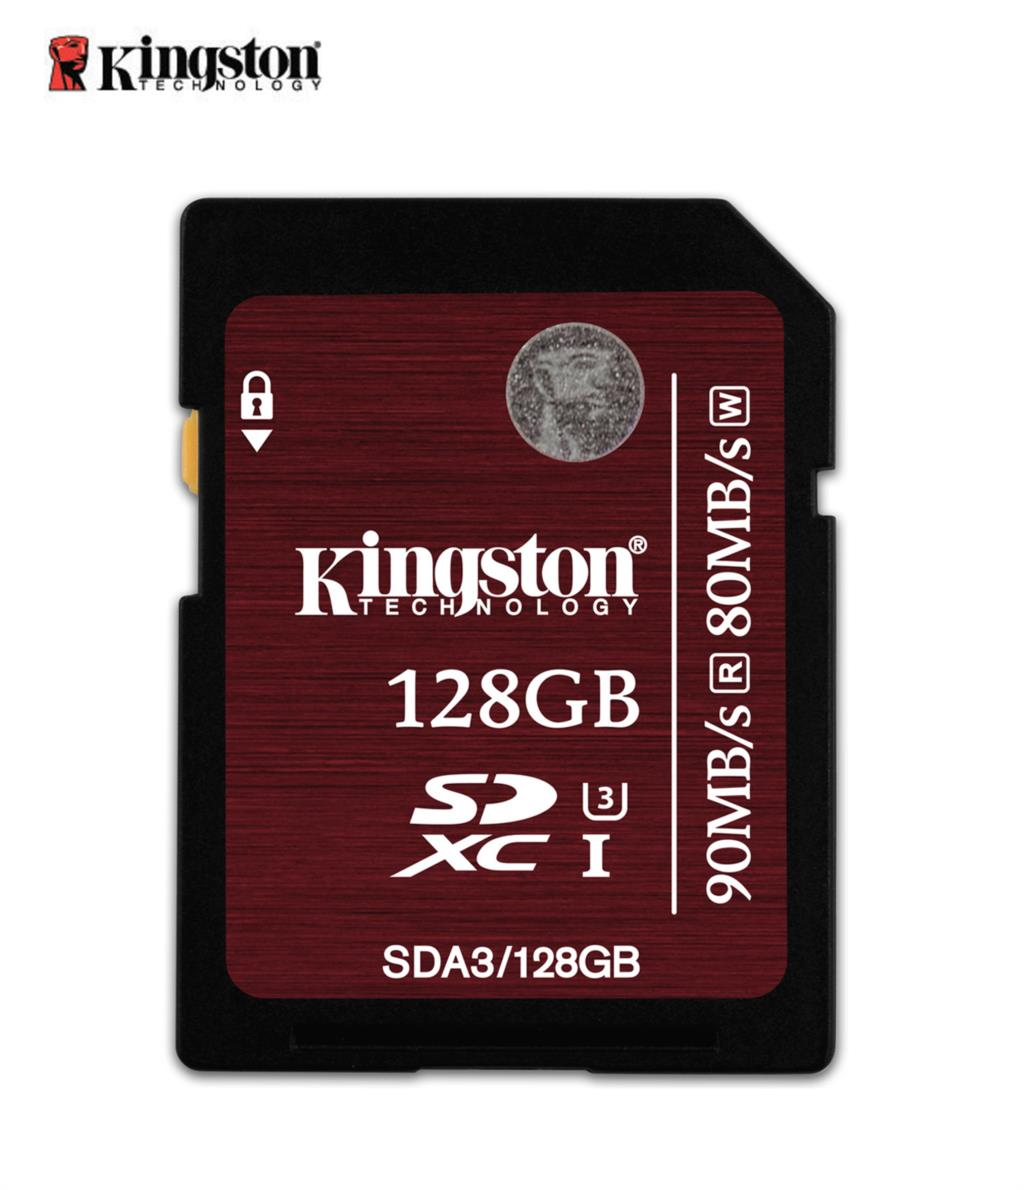 Kingston Class 10 tarjeta memoria card sdxc memory card camera reader 128gb sd card карта памяти other 32gb 10 memoria microsd 32g cartao memoria 32 sd 32gb memoria sd